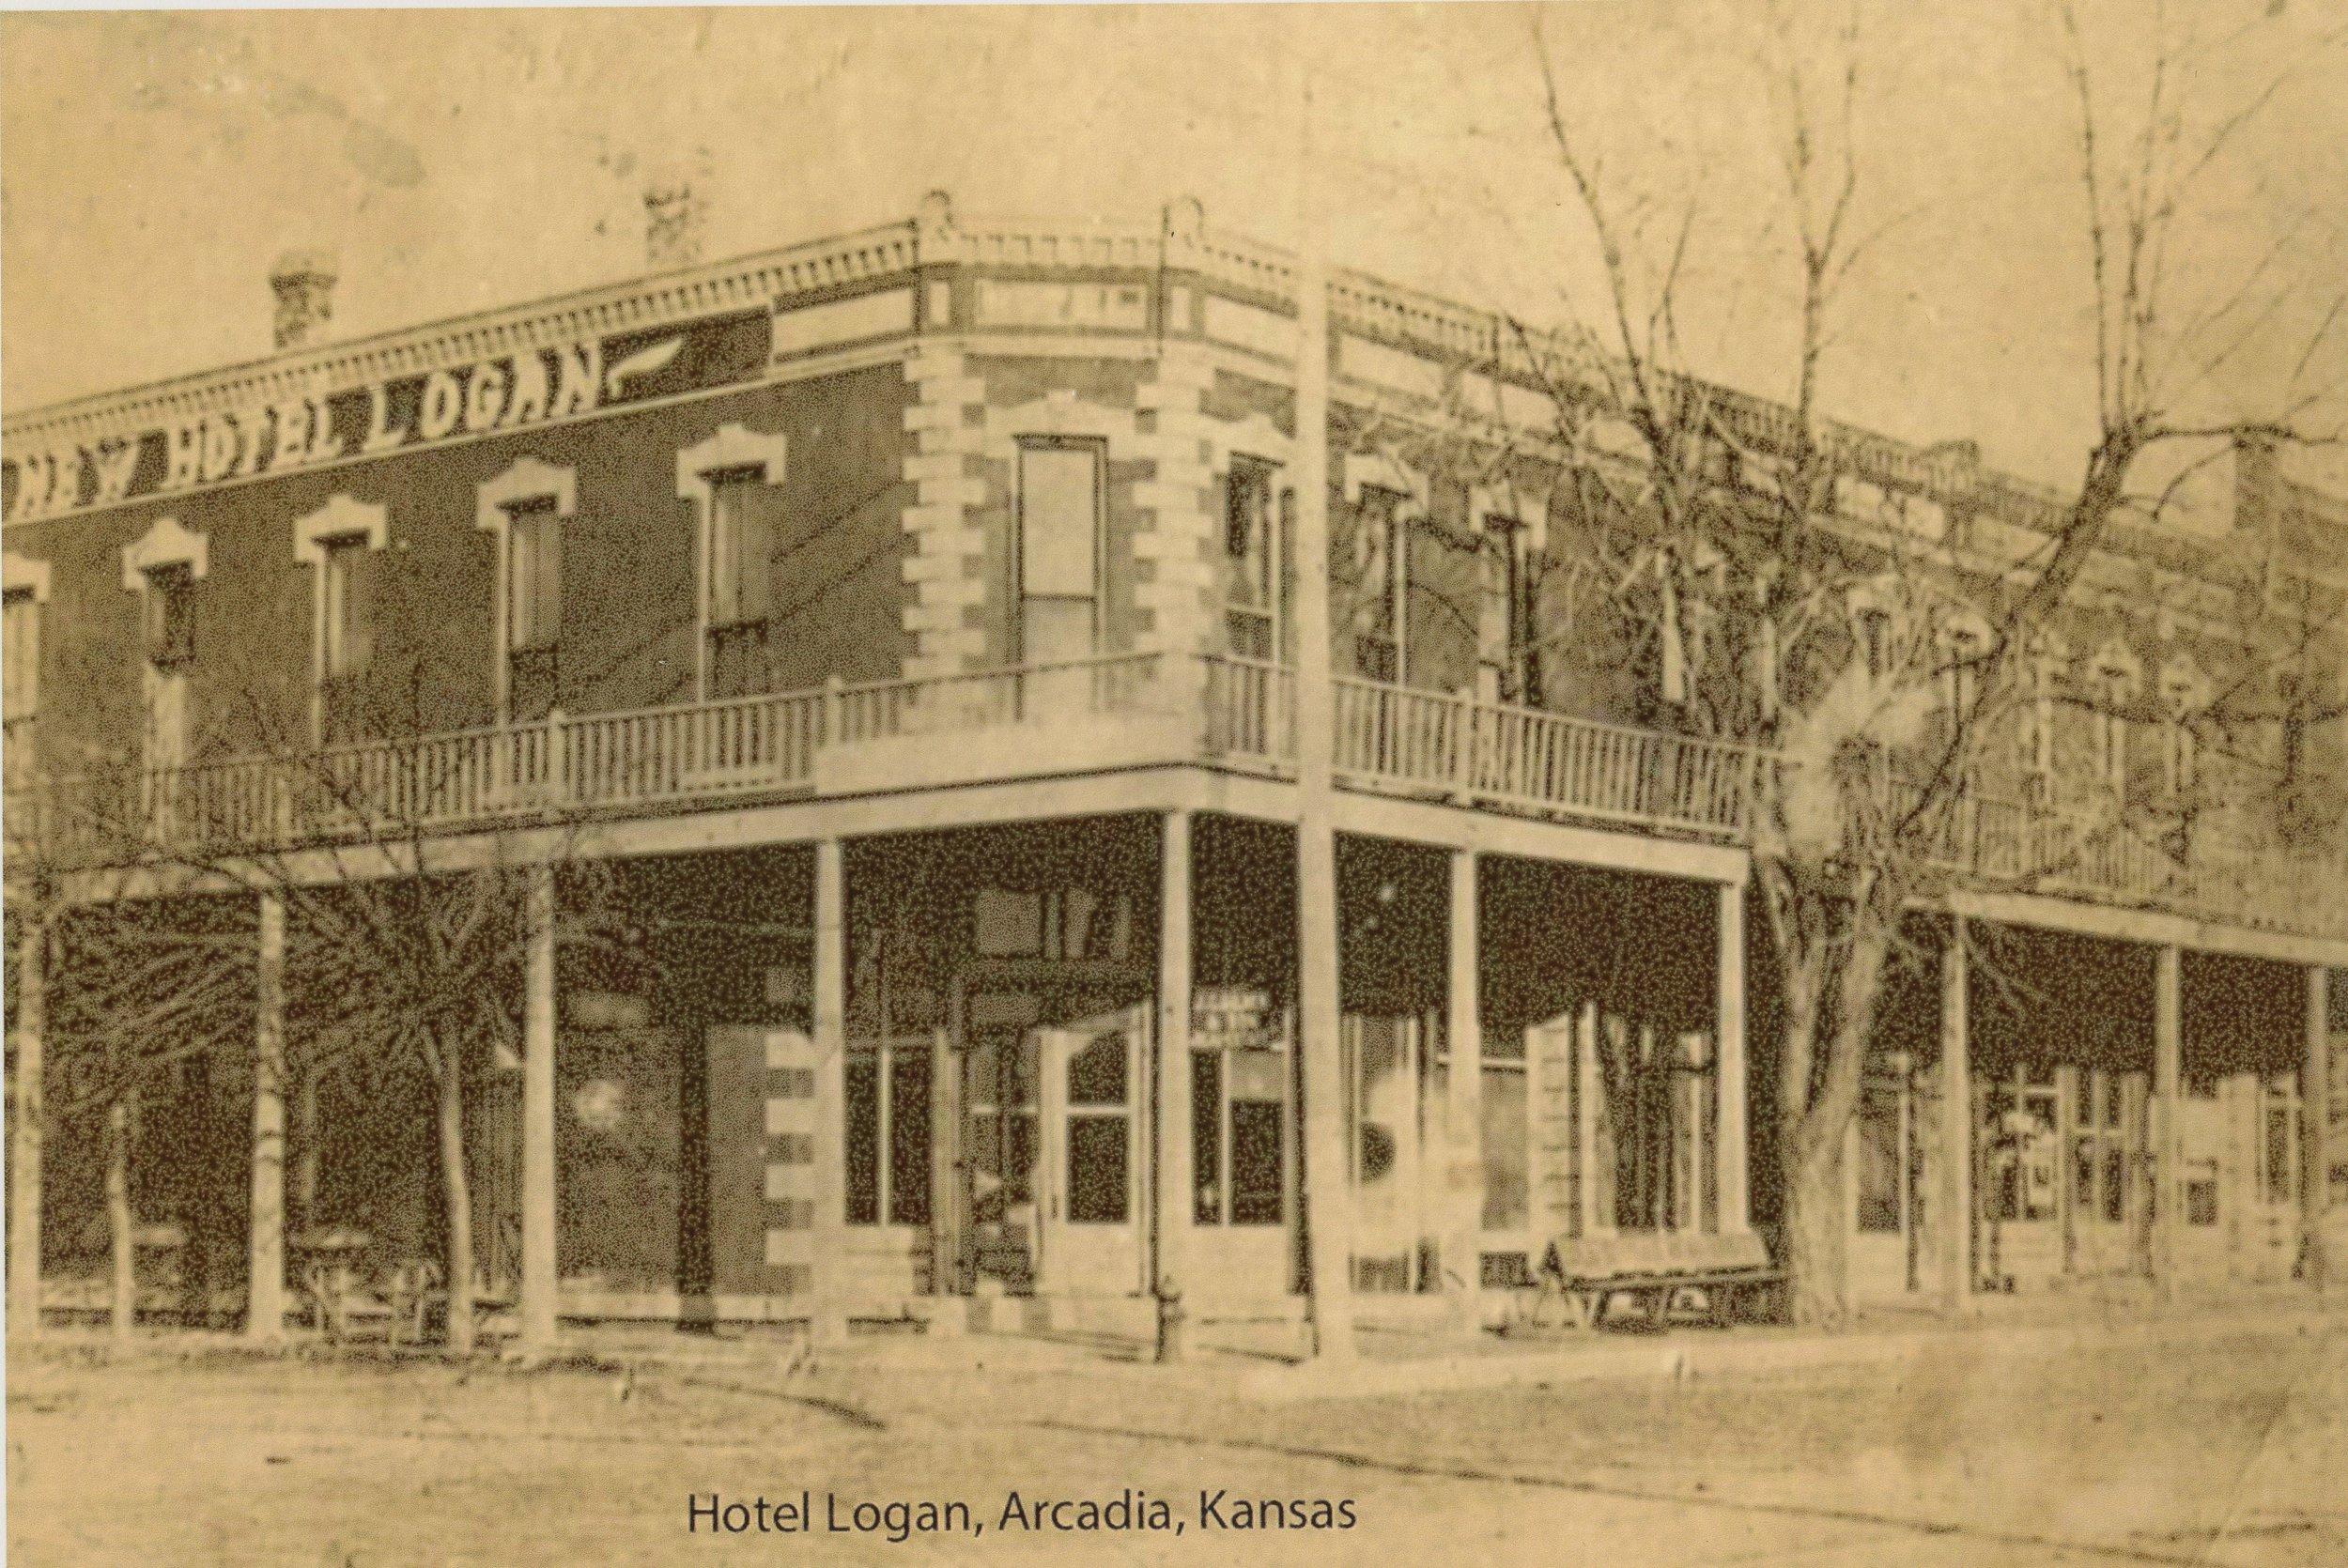 Arcadia mining camp, Crawford County, Kansas - Hotel Logan, Arcadia, KS